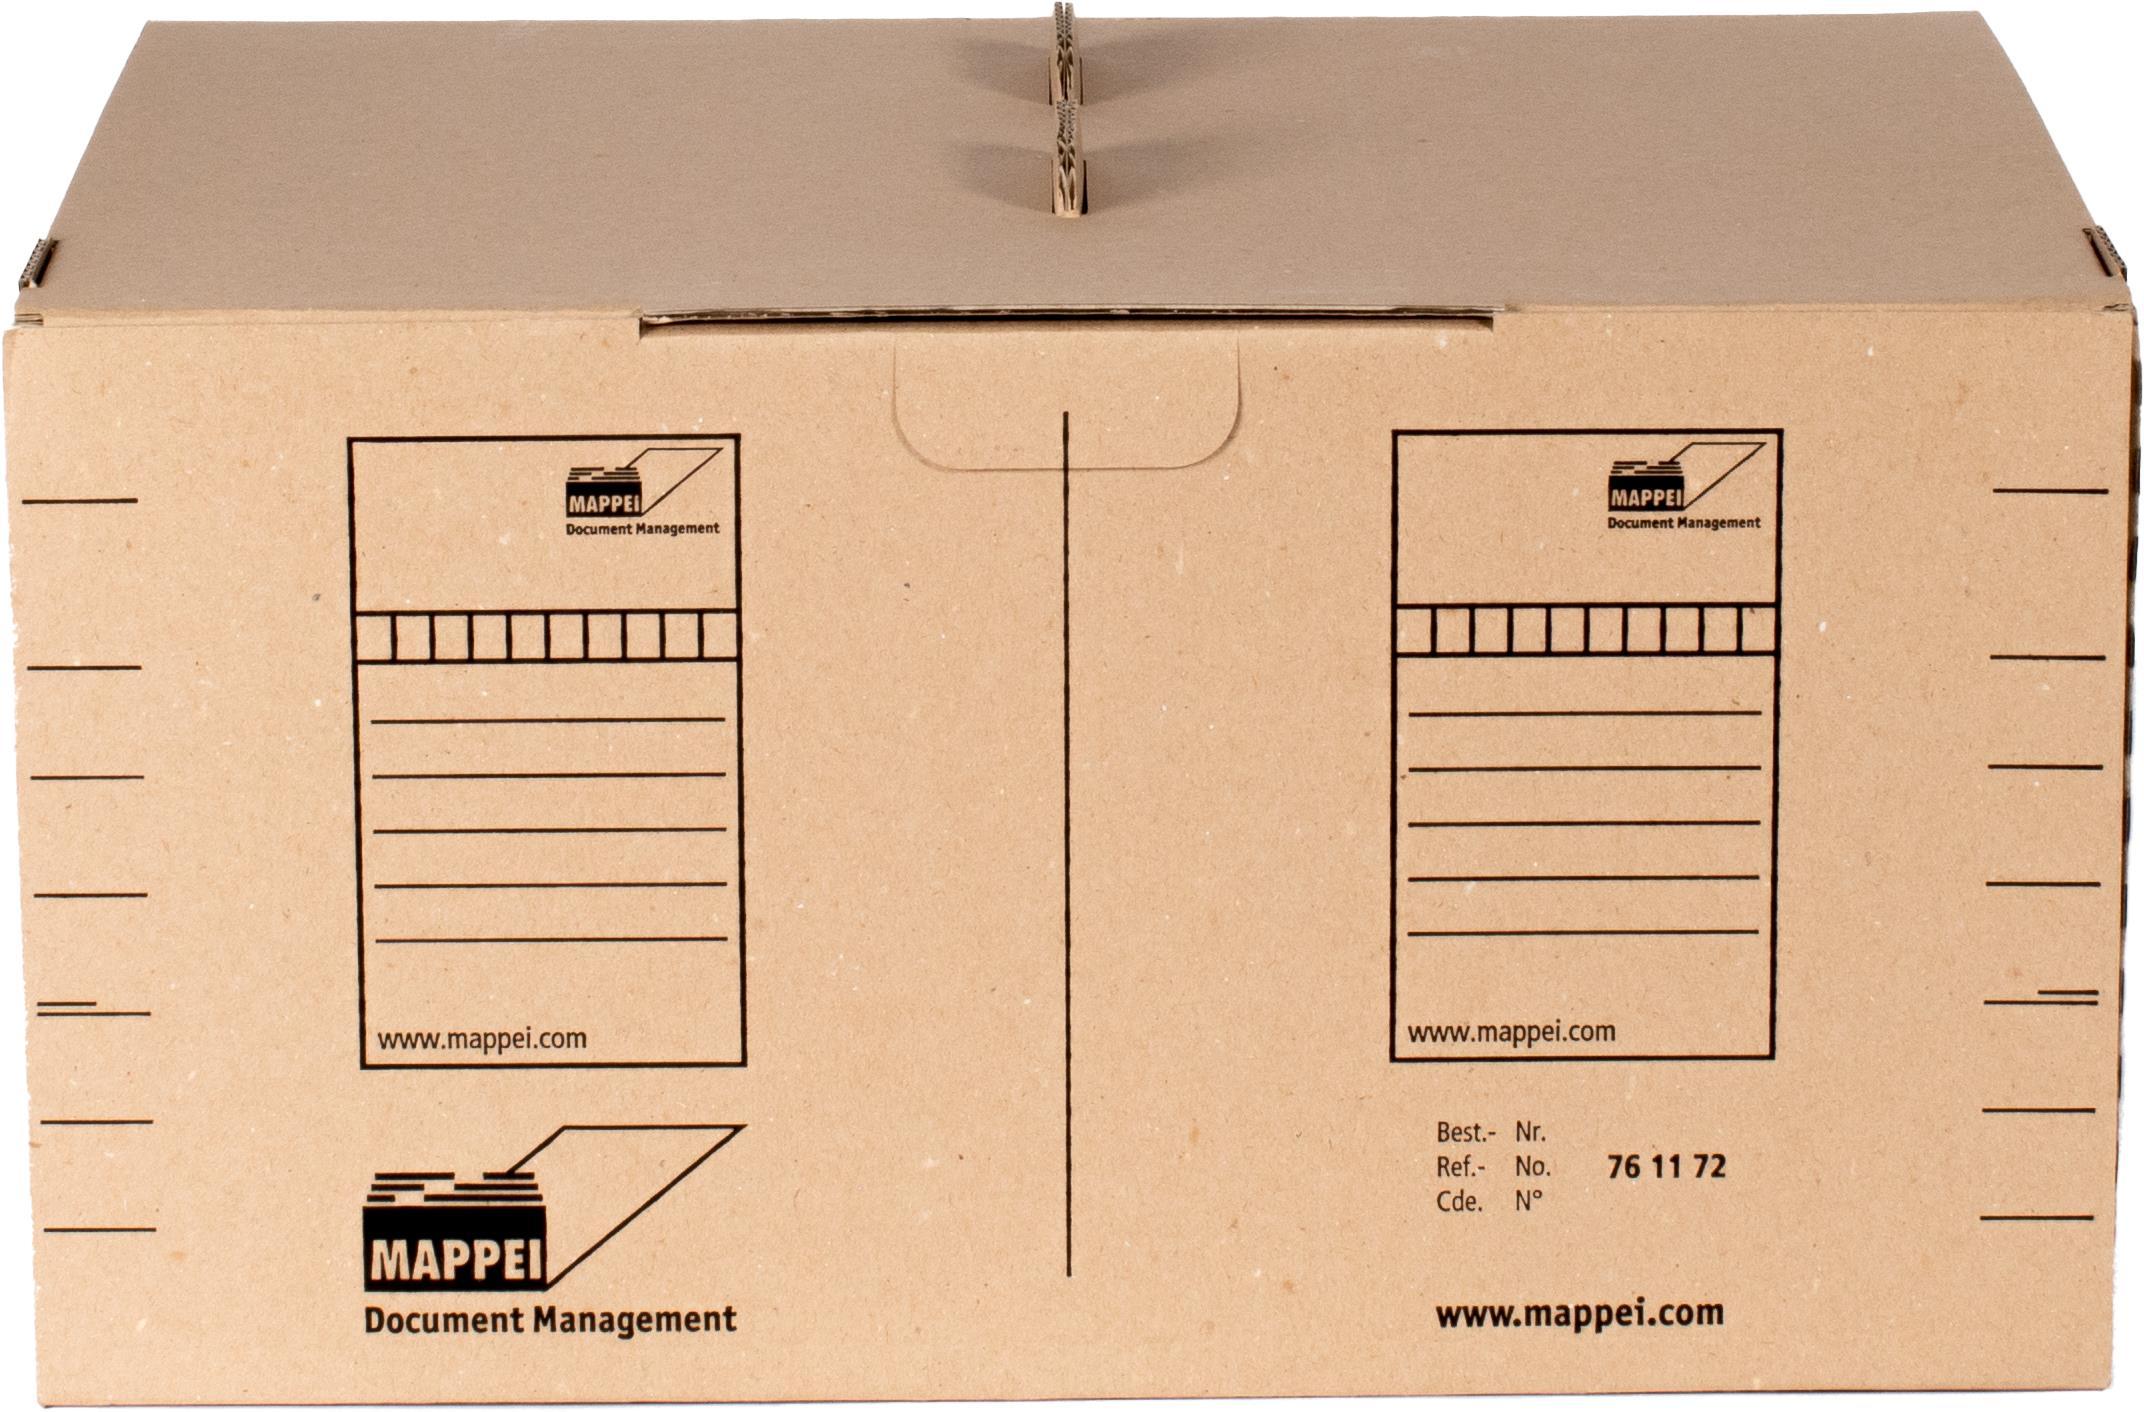 TABCOLOR-Archivbox f. Mappen DIN A4, 450 x 350 x 250 mm